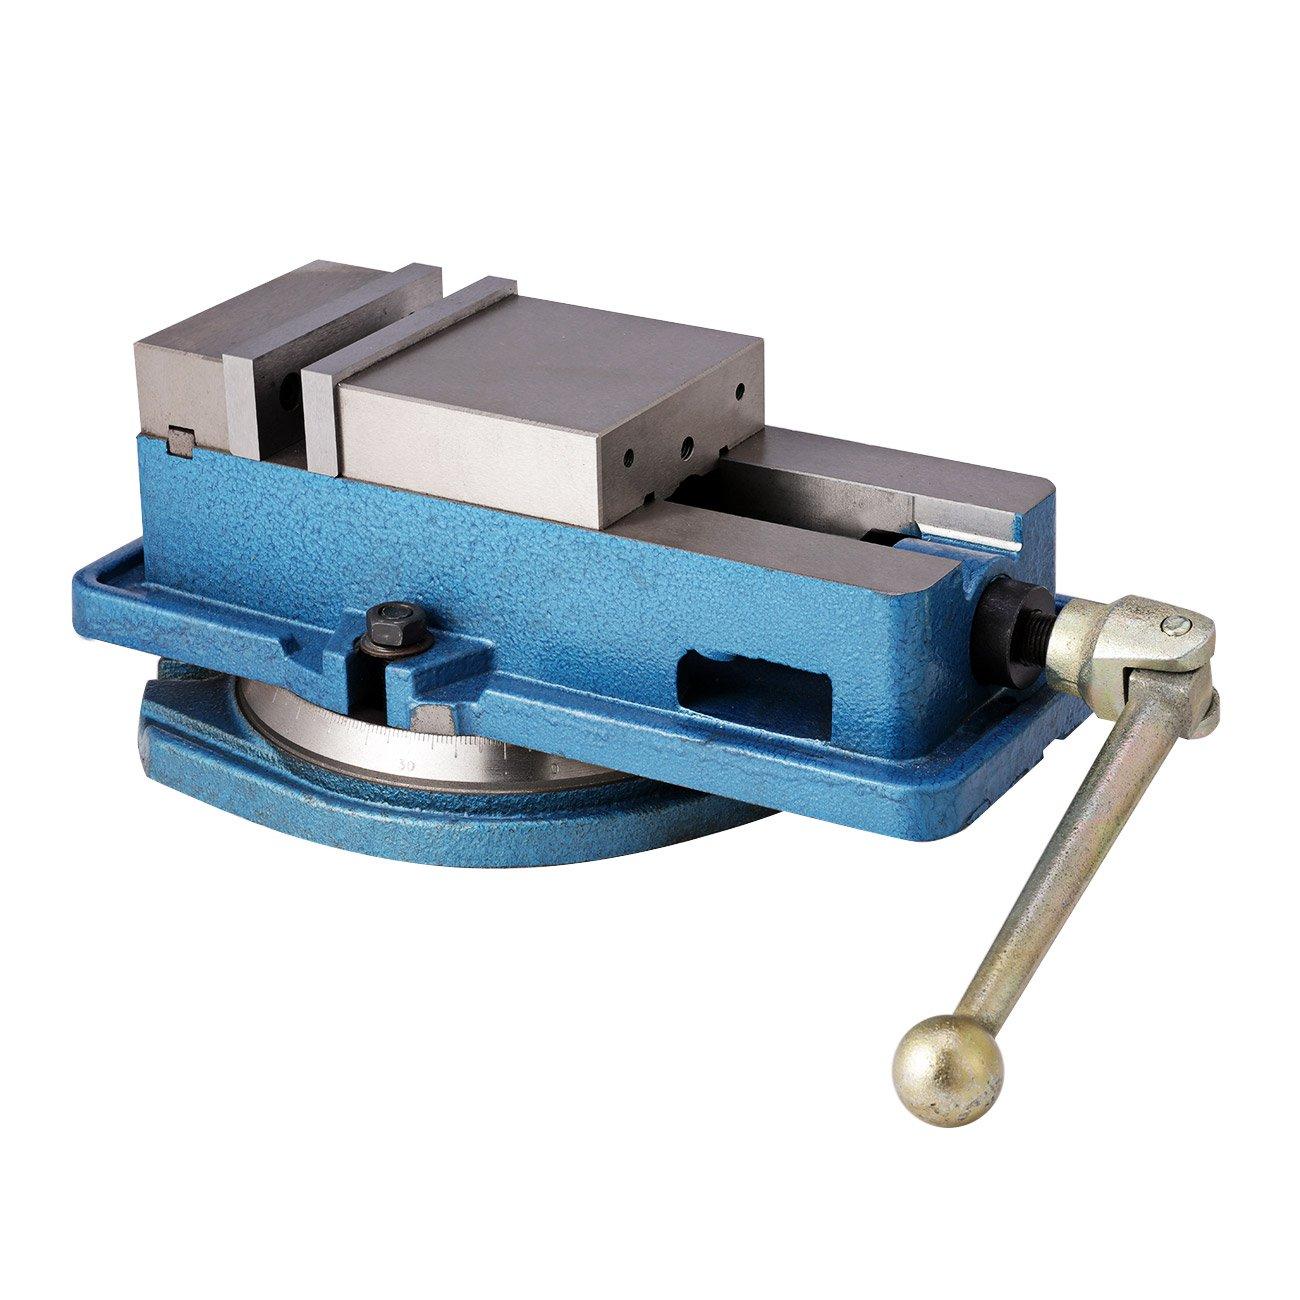 BEAMNOVA 4'' Milling Machine Lockdown Vise 360 Degree Swiveling Base Hardened Metal Bench Vise 4 inch